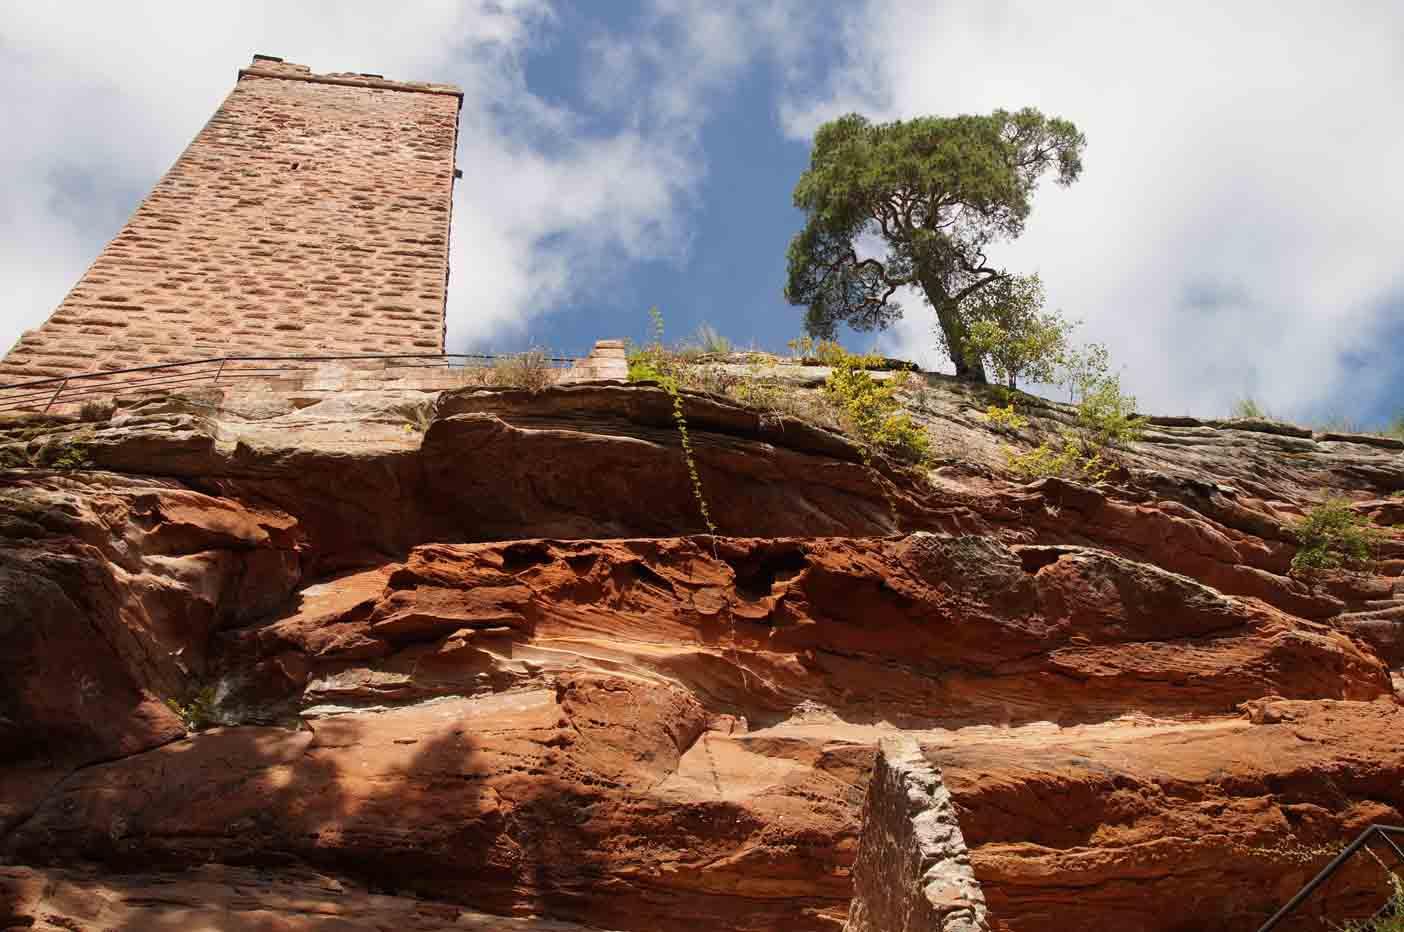 kasteel waldeck